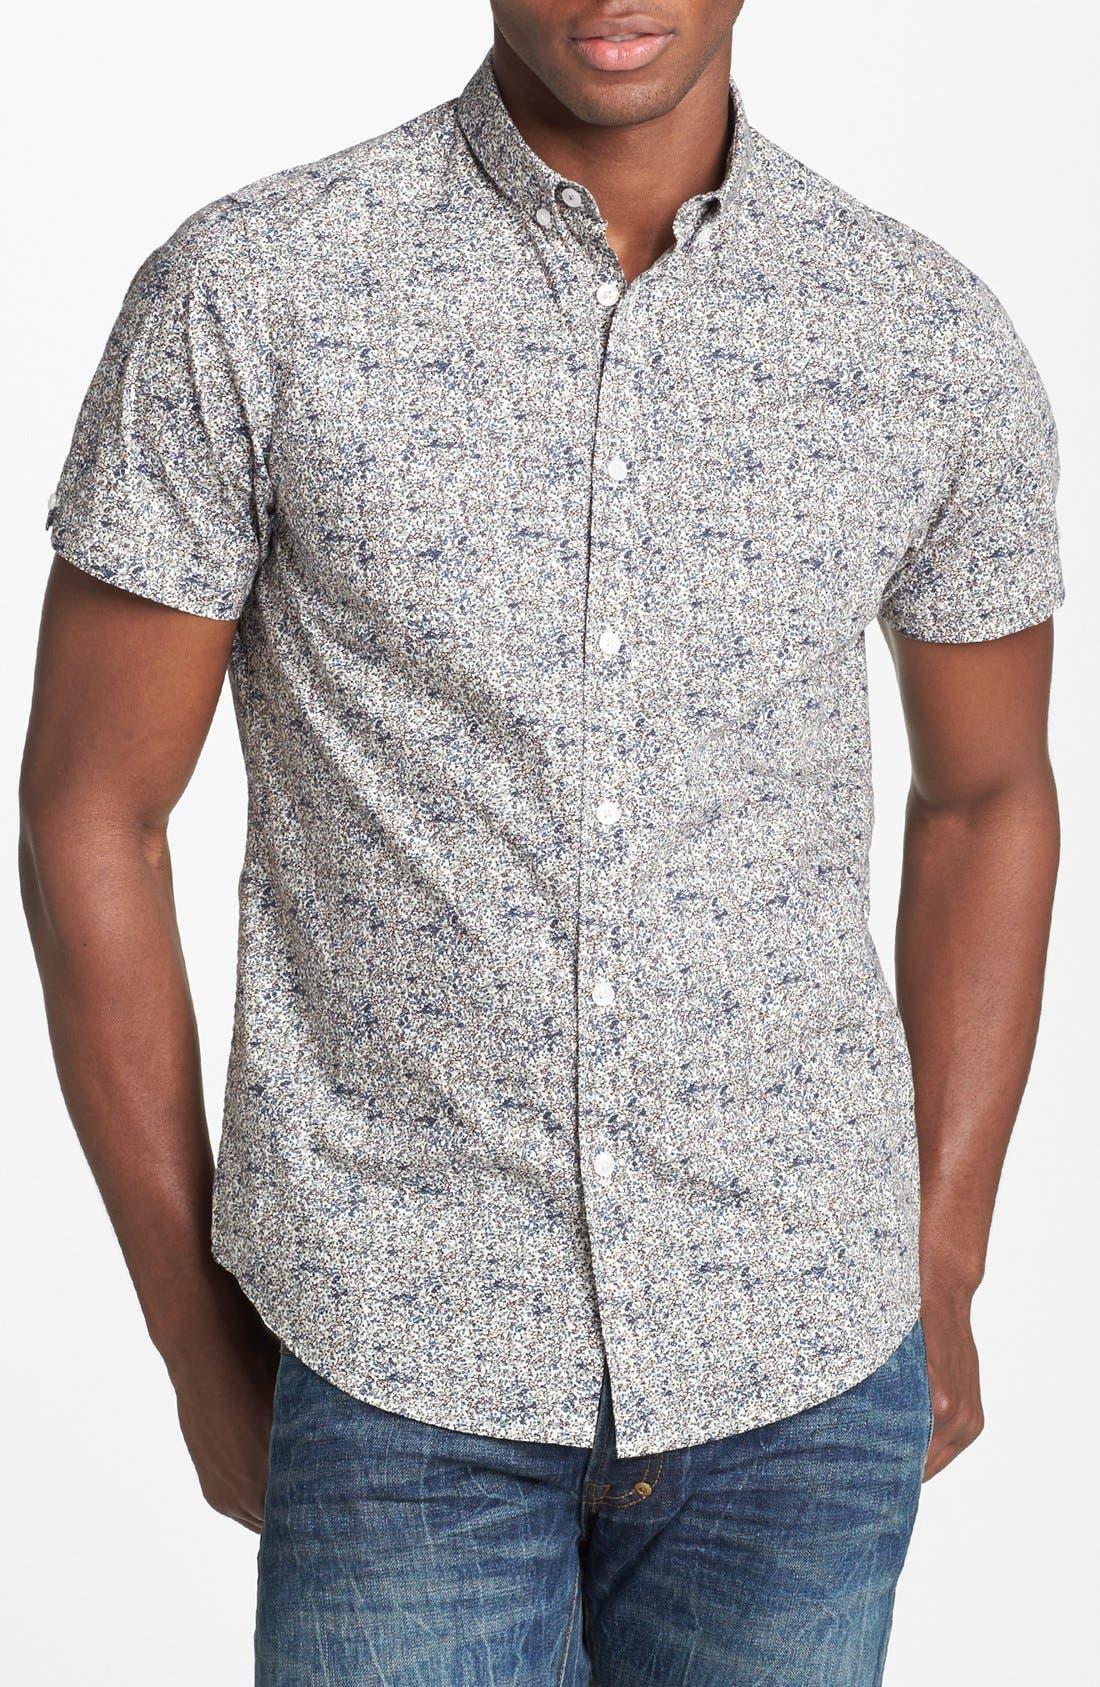 Alternate Image 1 Selected - Ben Sherman Floral Print Short Sleeve Woven Shirt